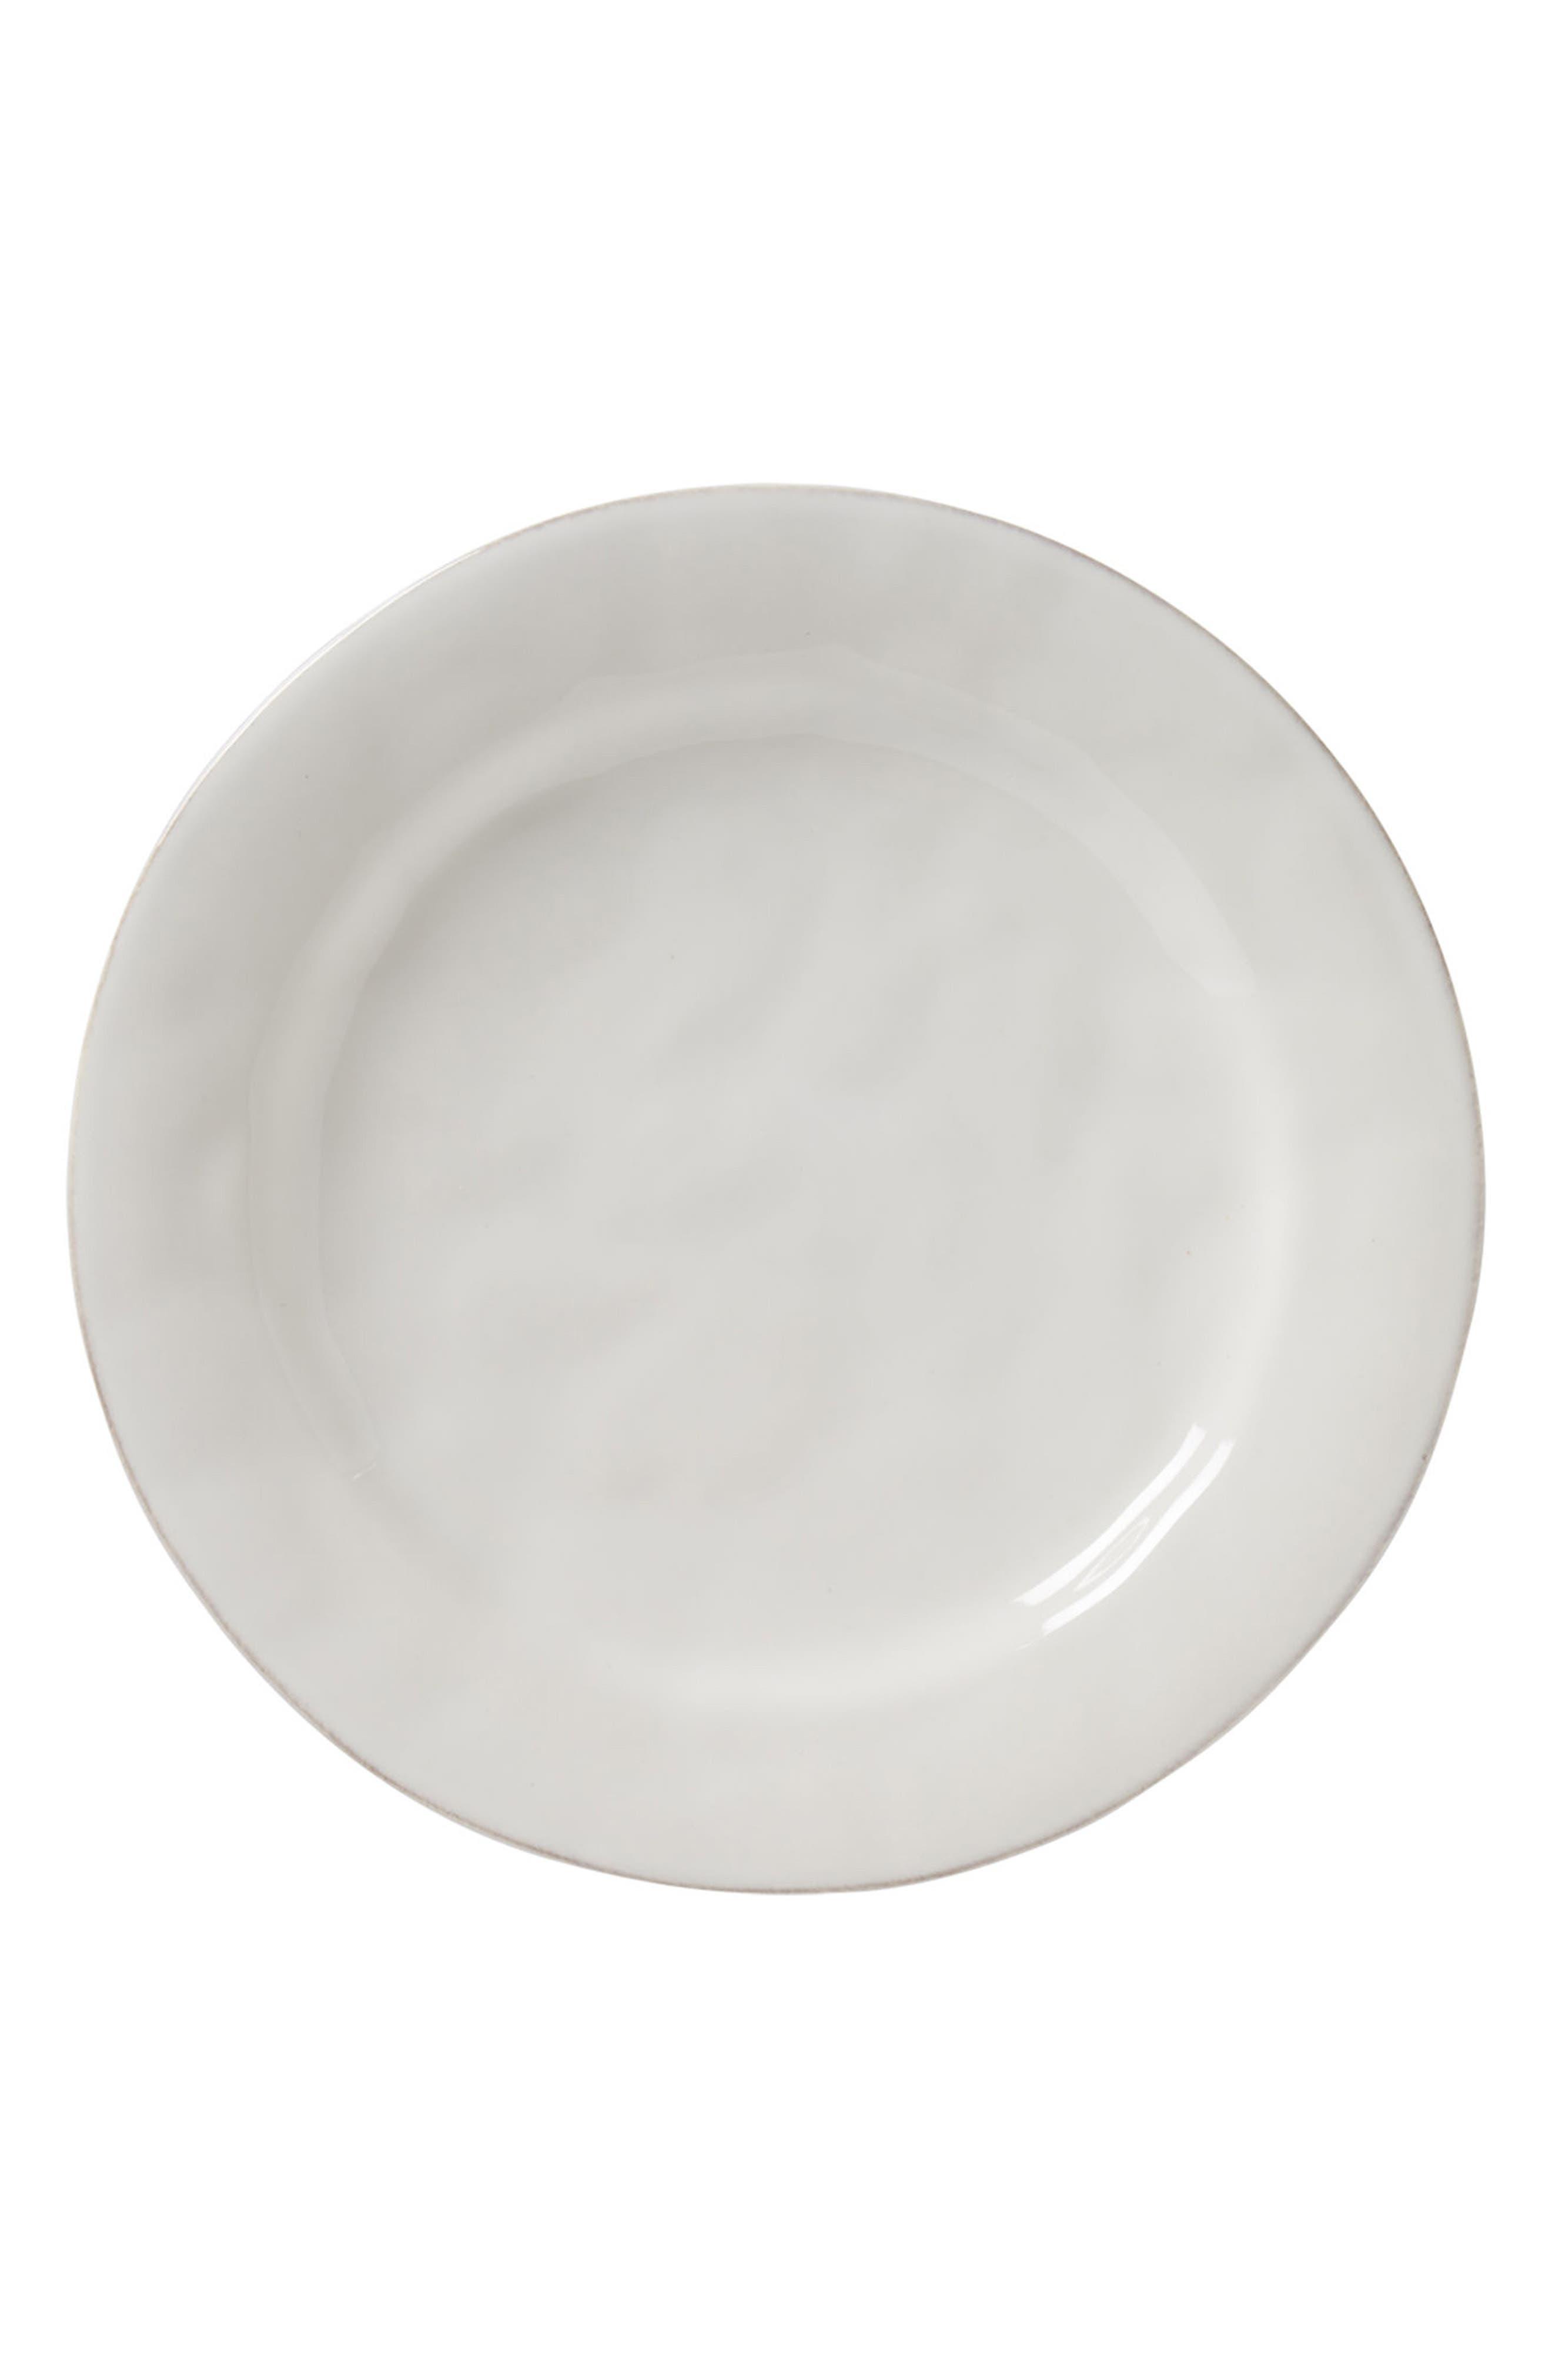 Puro Dinner Plate,                             Main thumbnail 1, color,                             Whitewash